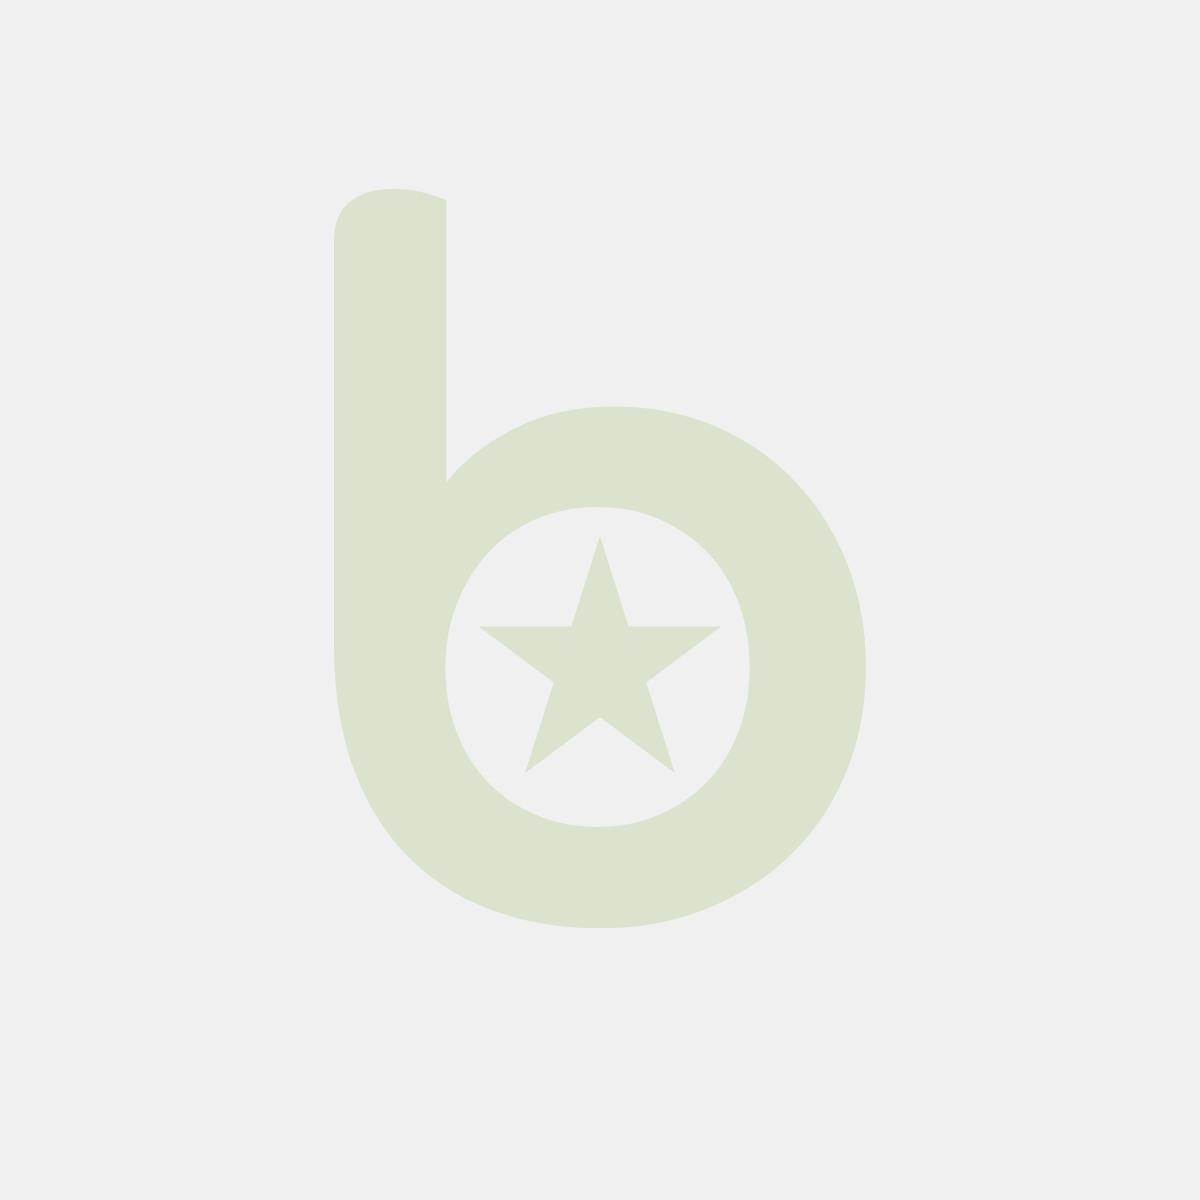 Torebka strunowa DONAU, PP PE-LD, A5, 100szt., transparentna